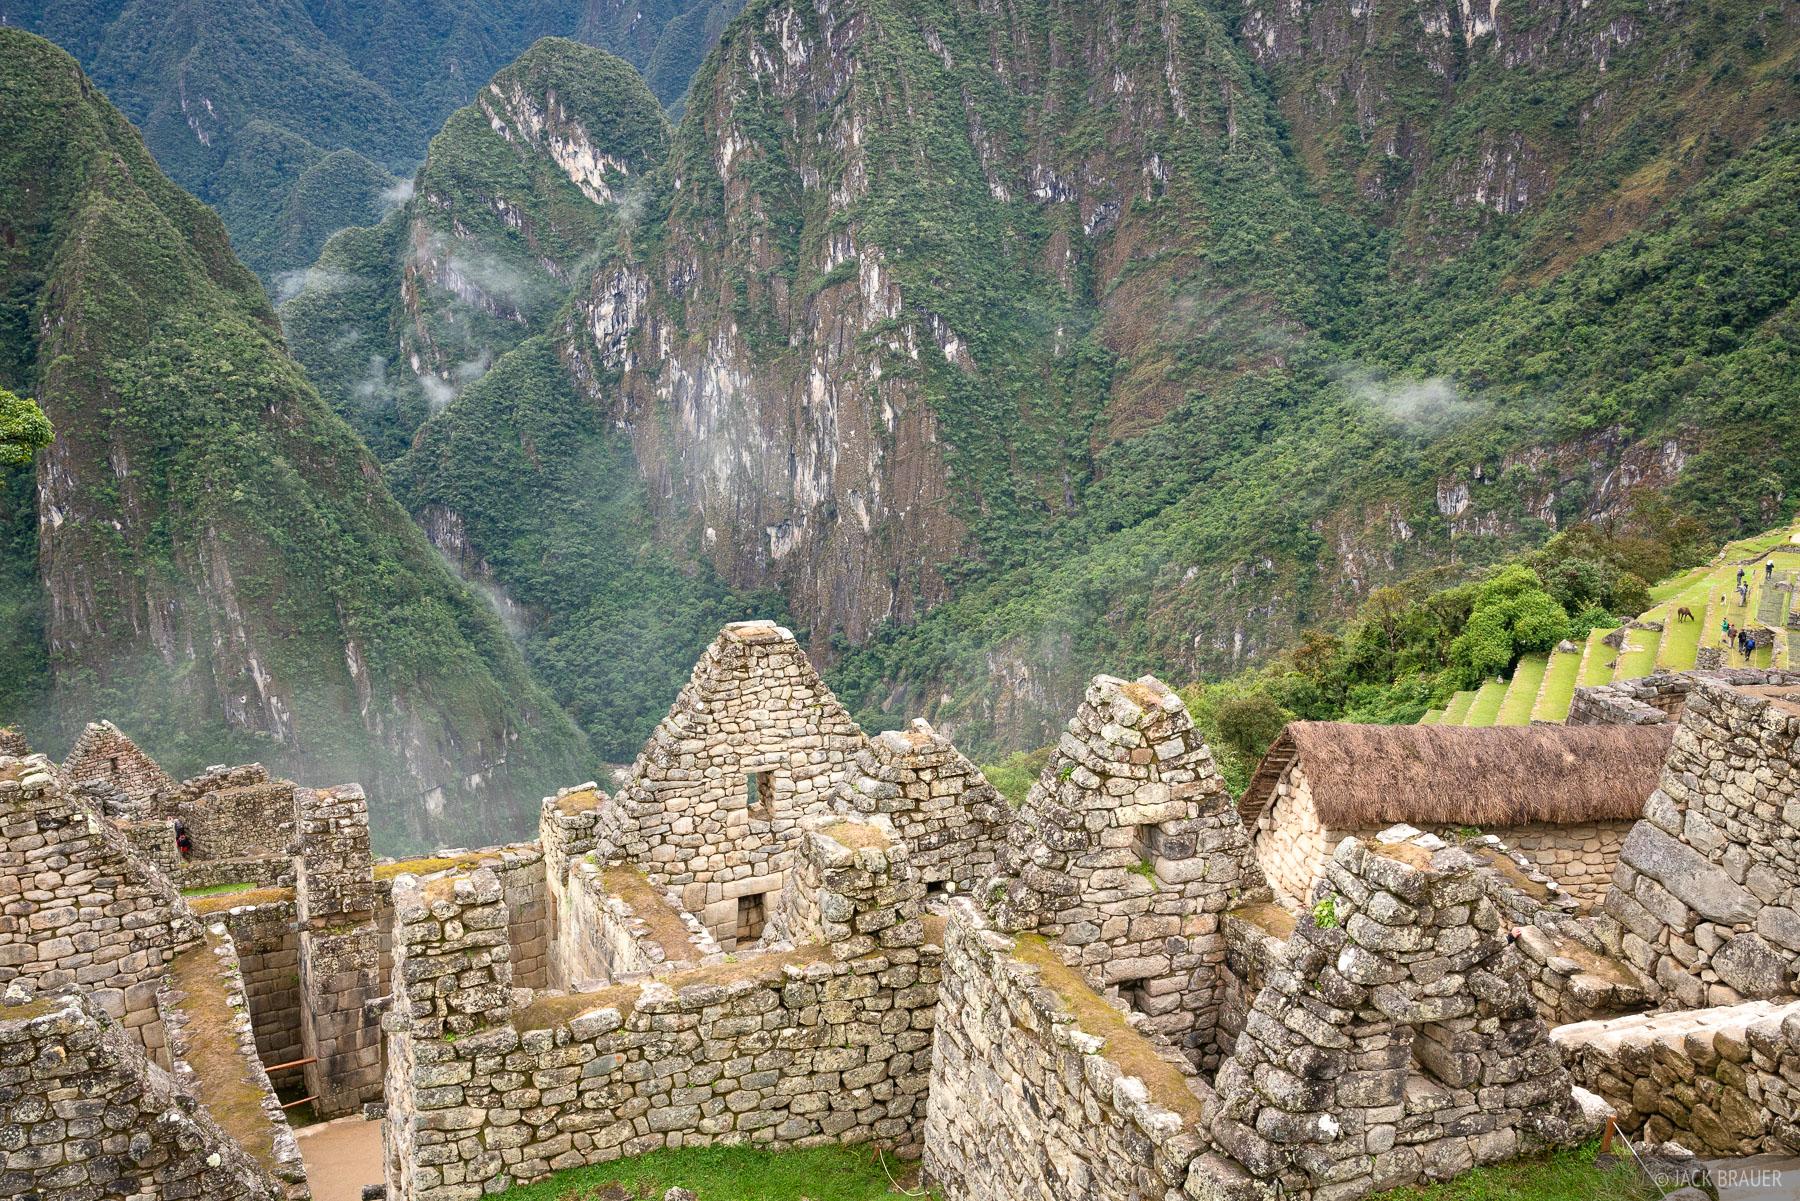 Cordillera Vilcabamba, Macchu Picchu, Peru, South America, photo